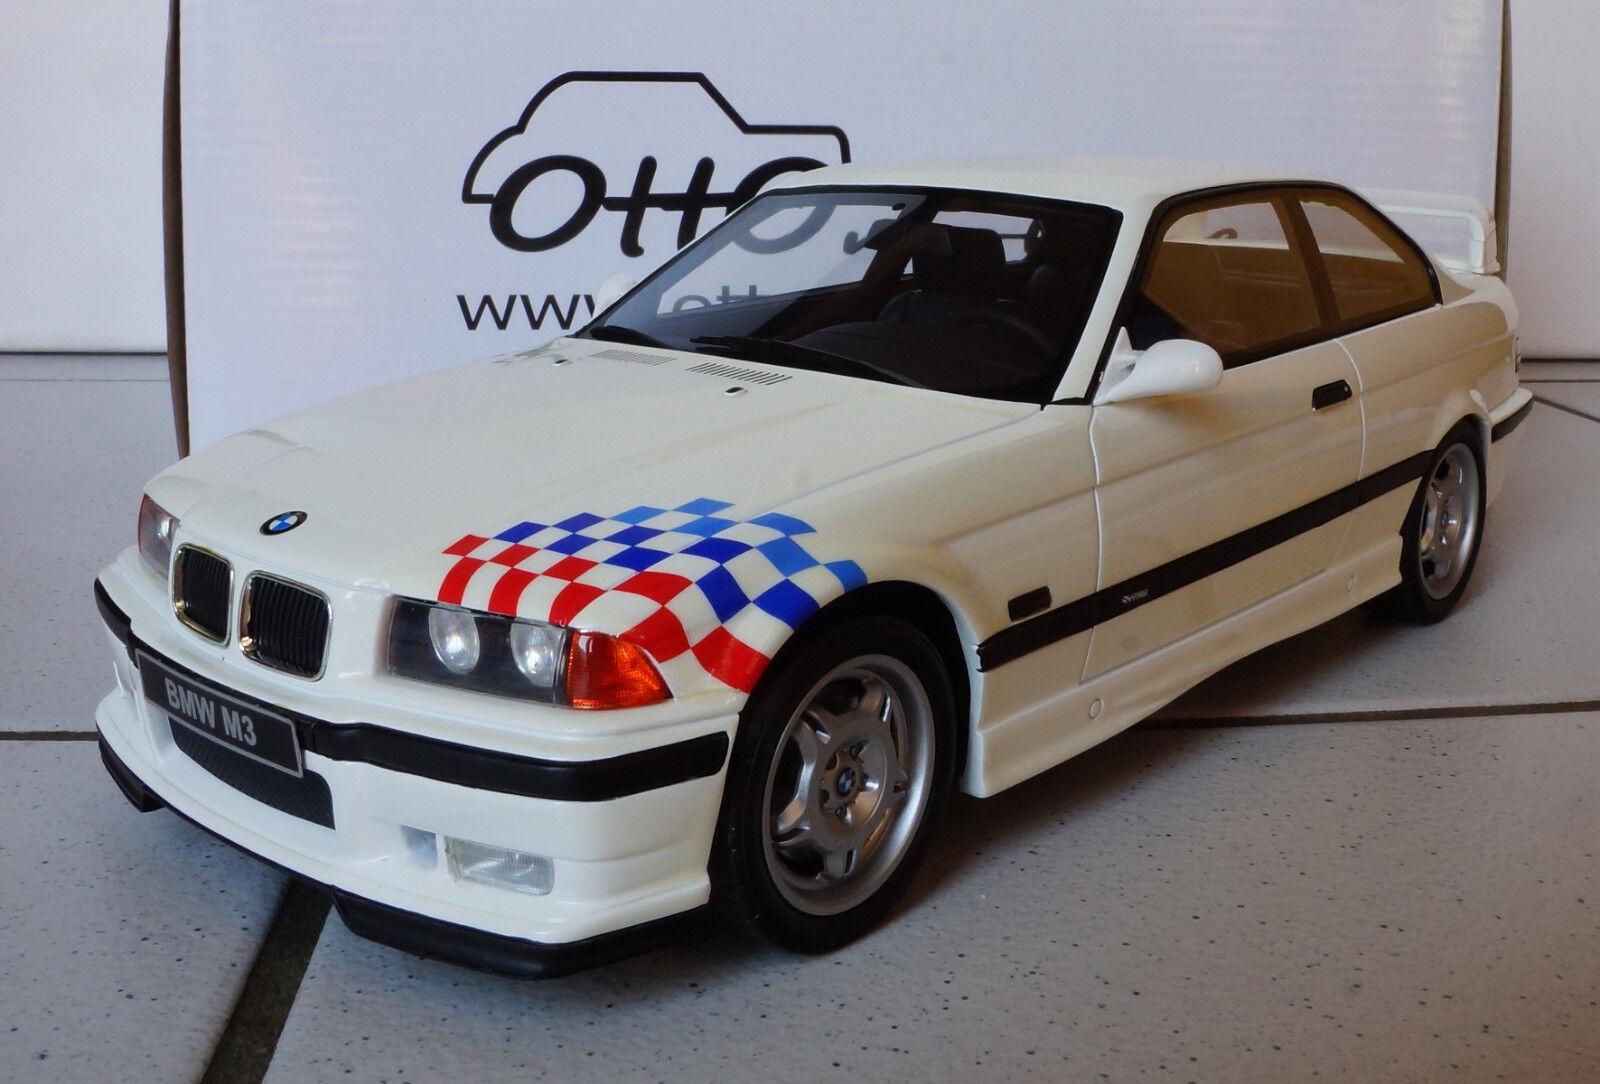 Ottomobile Ottomobile Ottomobile 1:18 BMW m3 e36 Light Weight, blanc/m-drapeau, ot569, Neuf  neuf dans sa boîte, En parfait état, dans sa boîte | Dans Plusieurs Styles  991fda